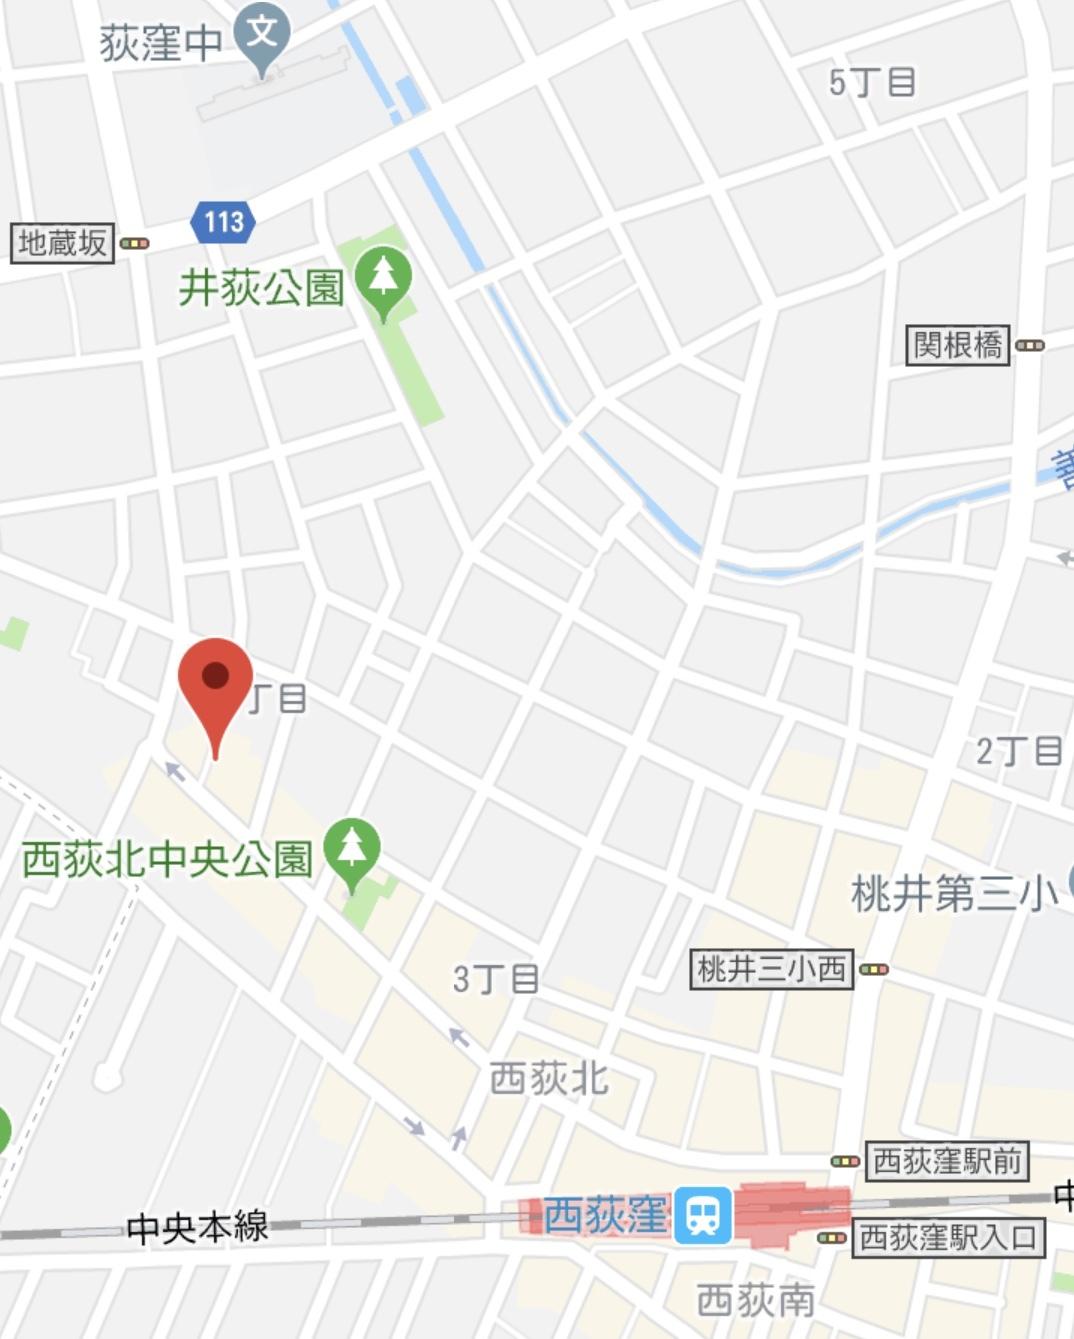 ㊗️10周年🎊えんツコ堂製パンさん @西荻窪_a0137727_20511124.jpeg